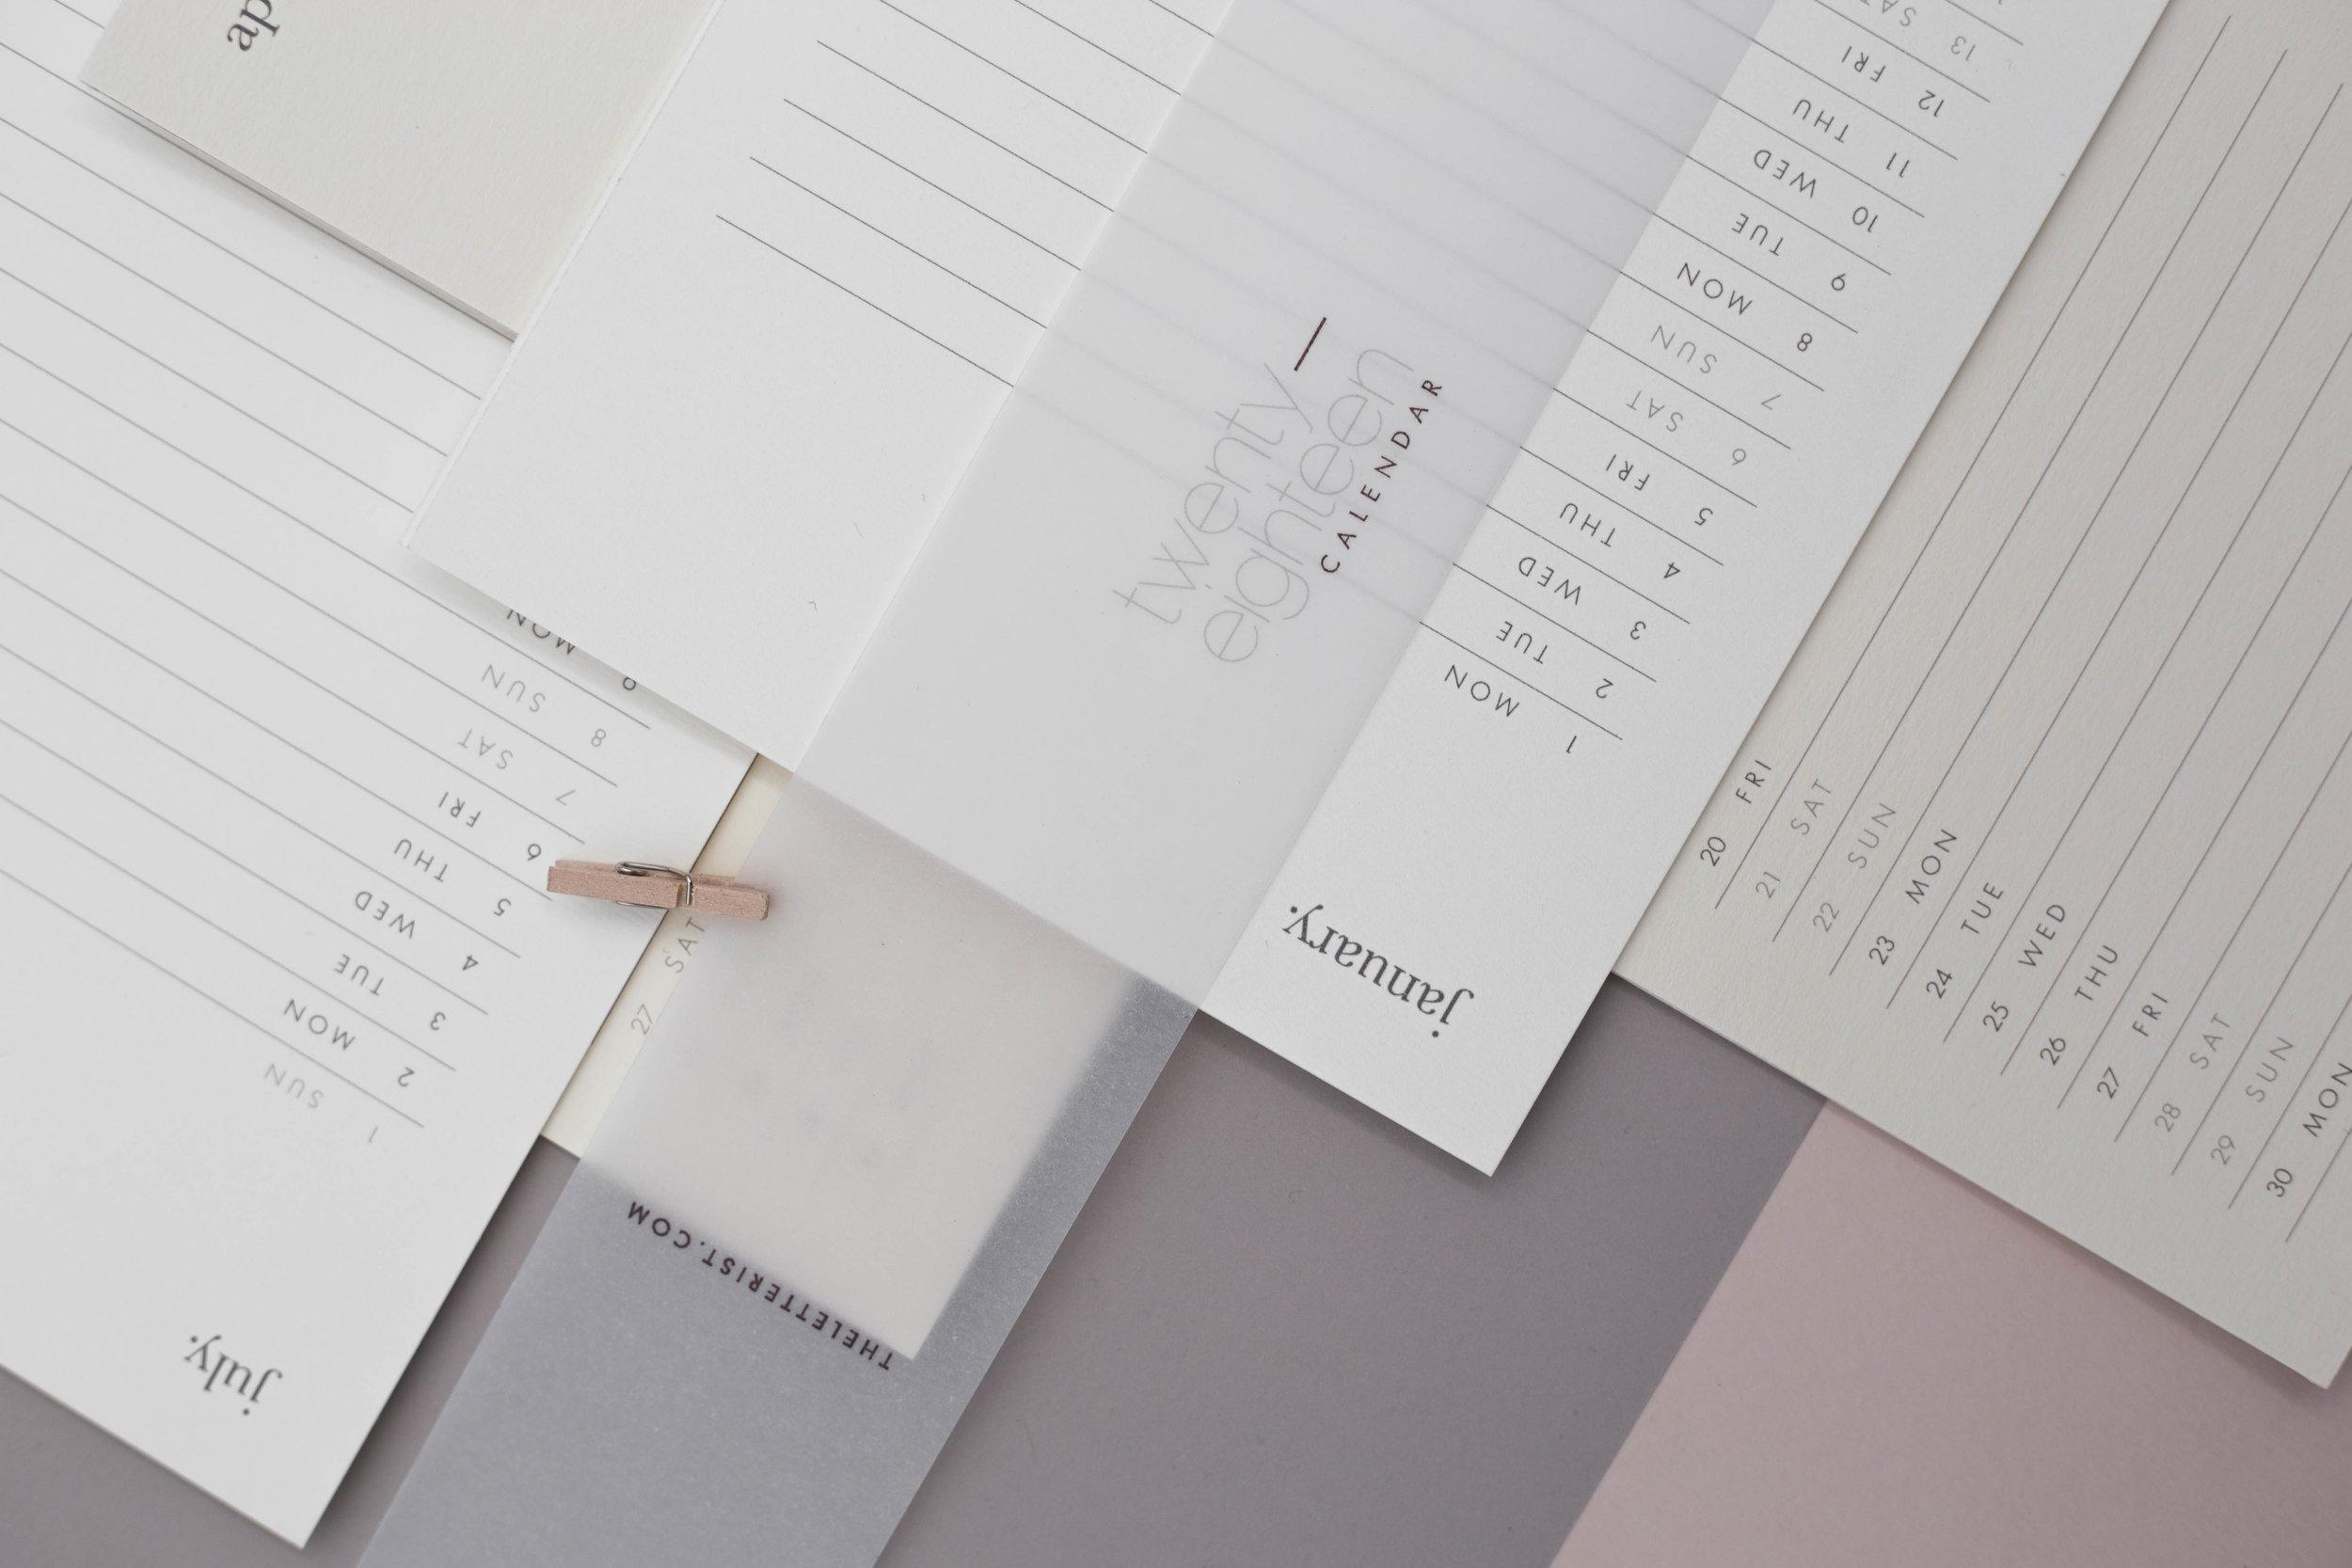 the-letterist-2018-calendar-01.jpg